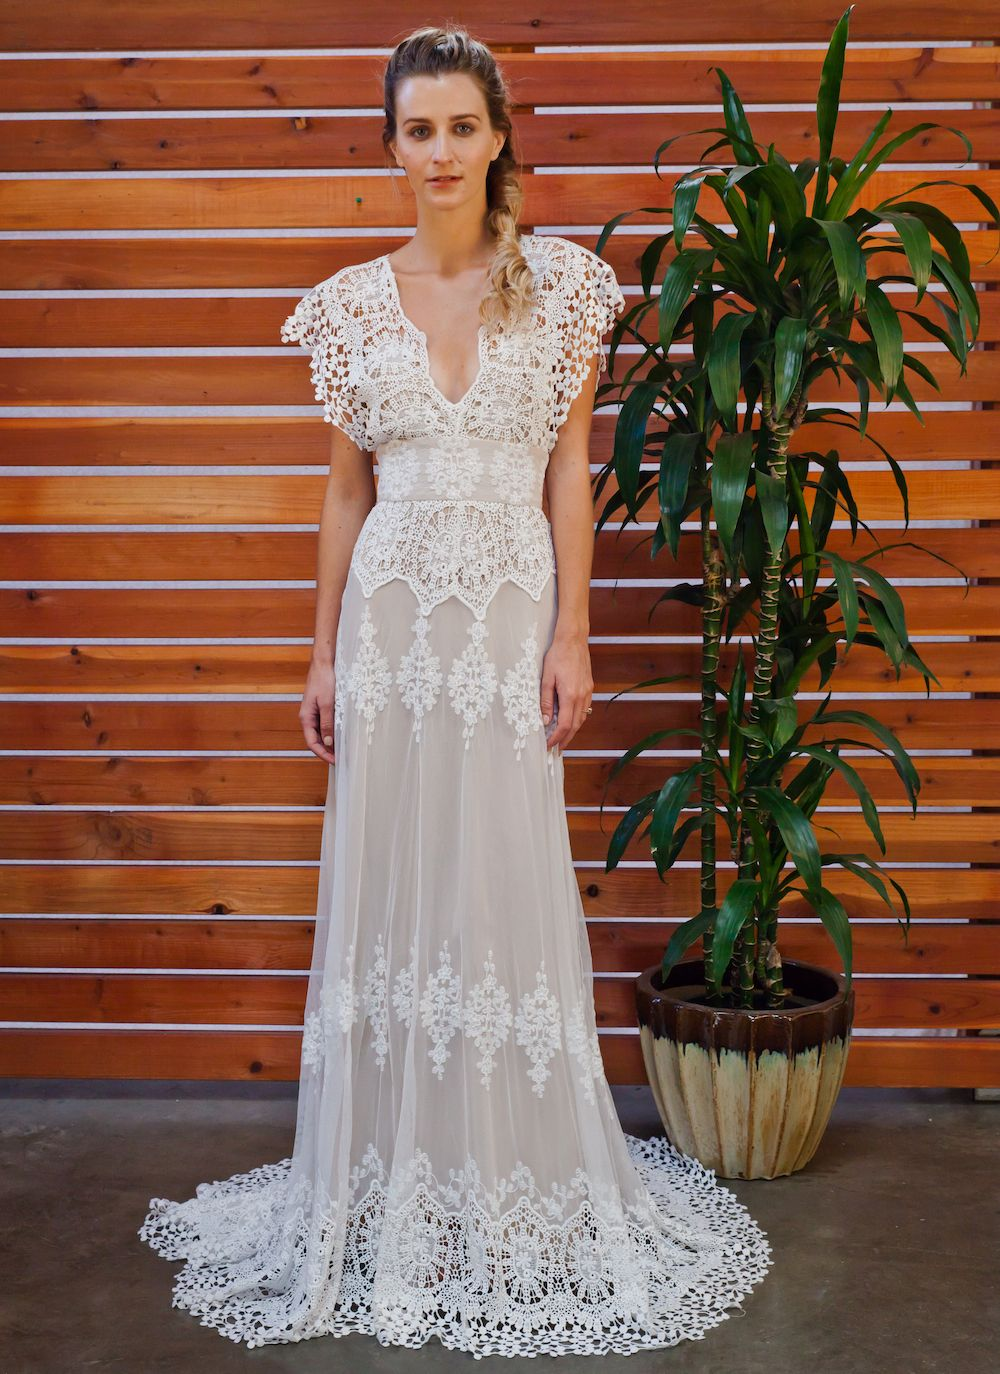 Azalea Draped Cotton Lace Wedding Dress Beach Wedding Dress Boho Bohemian Wedding Dress Lace Wedding Dresses Lace